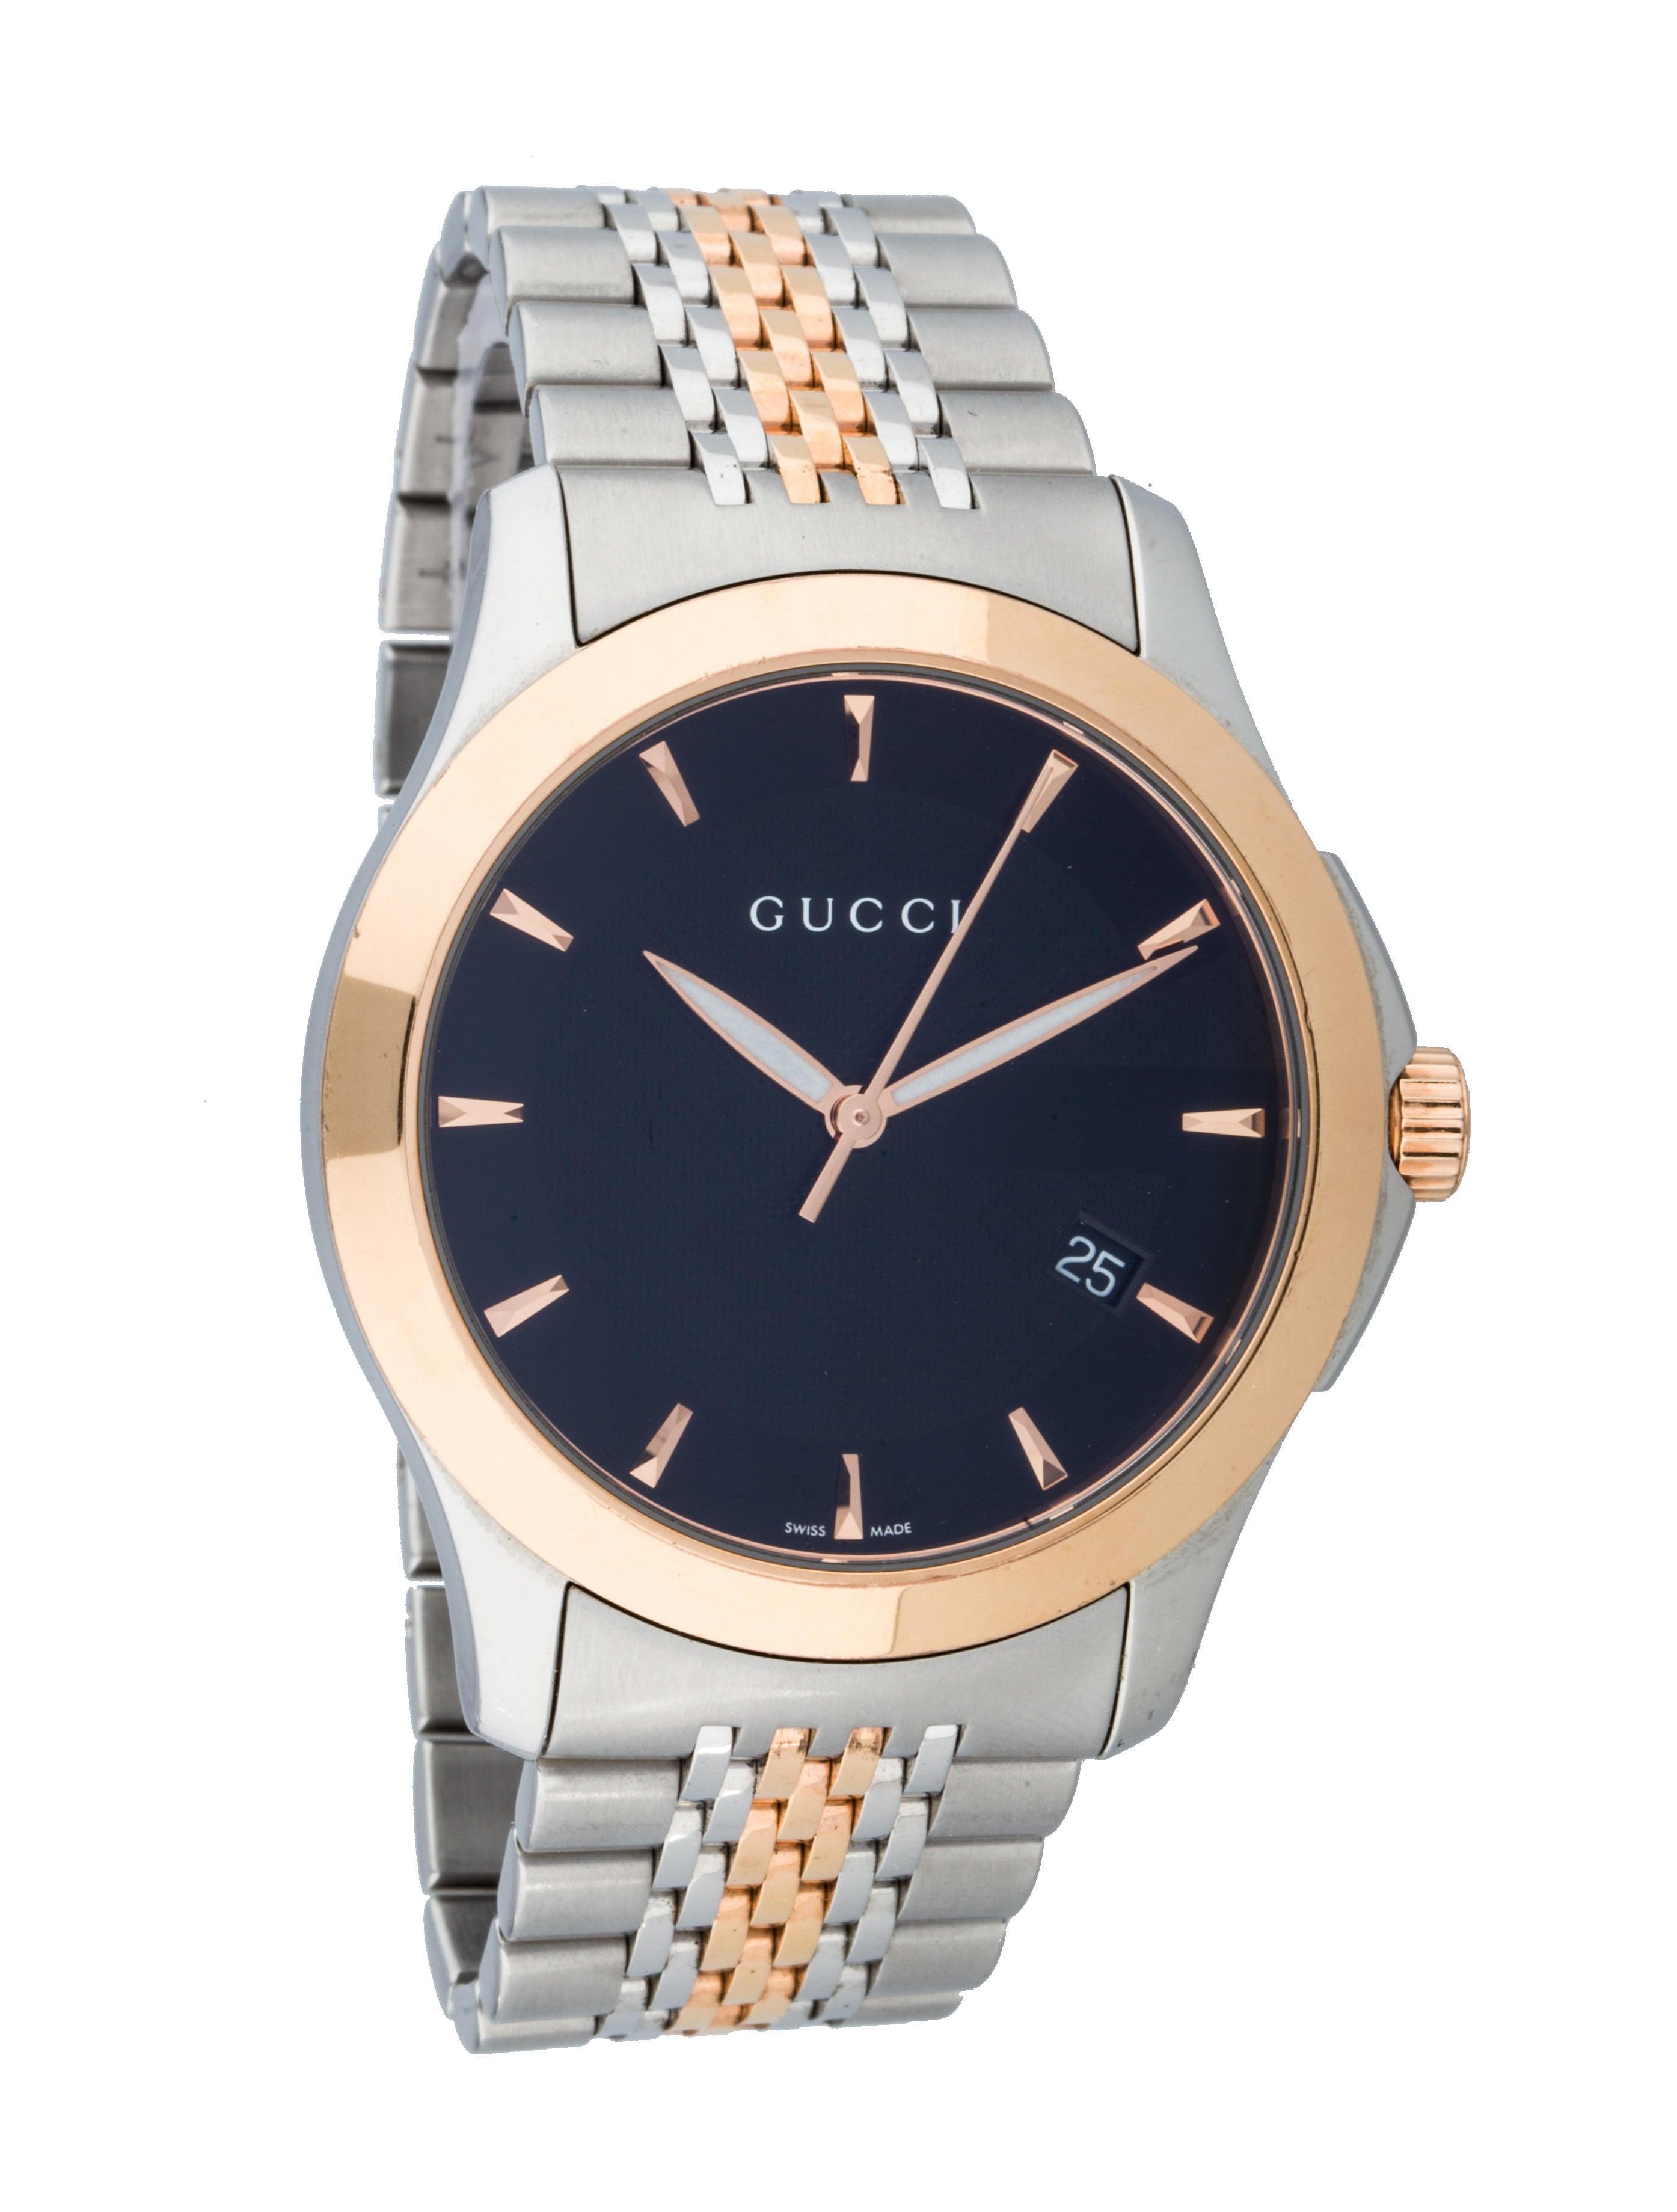 36516ce8c98 Gucci 126.4 Timeless Watch - Bracelet - GUC47937